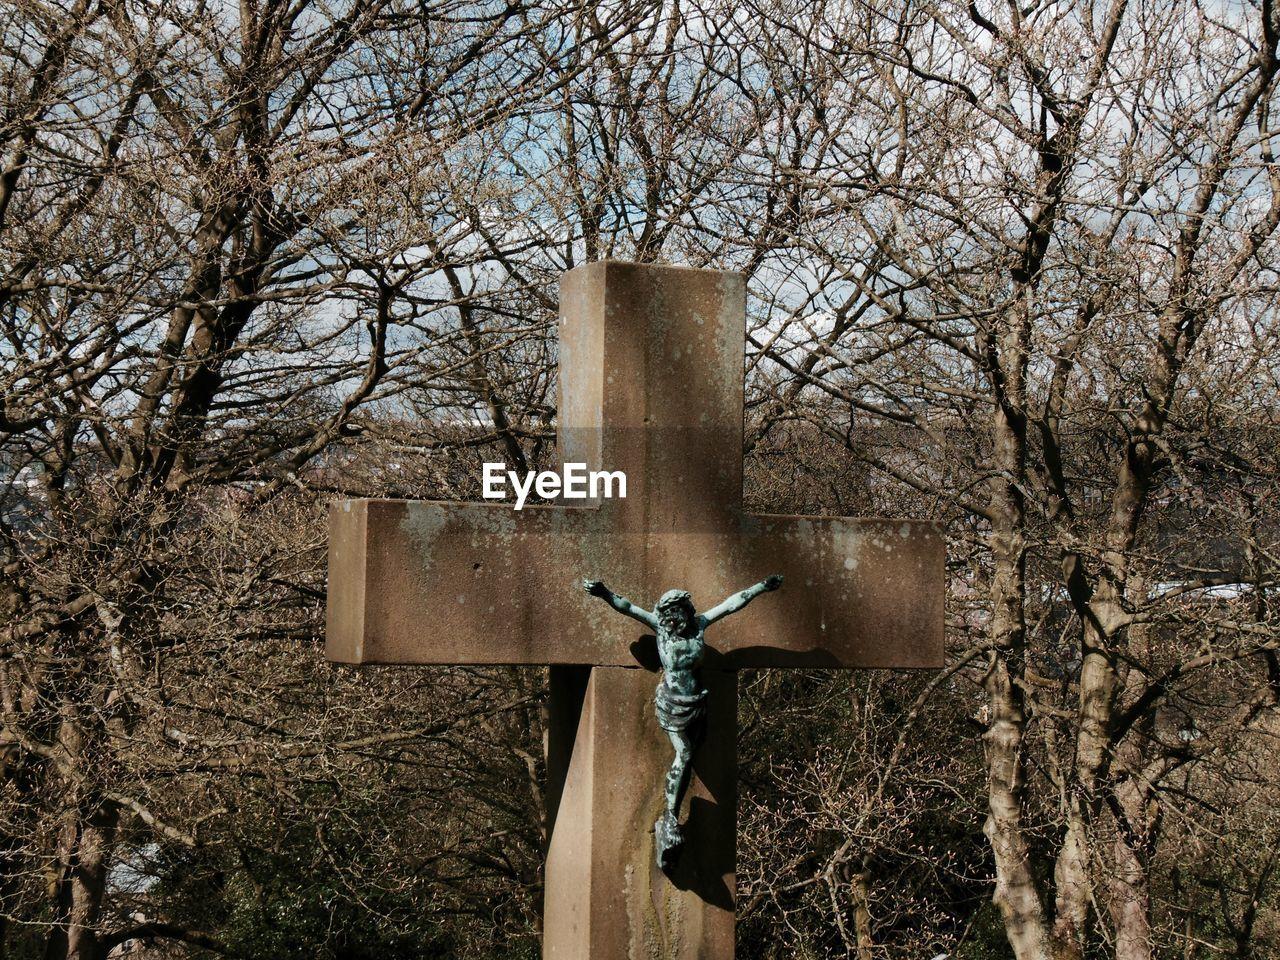 Crucifix against bare trees